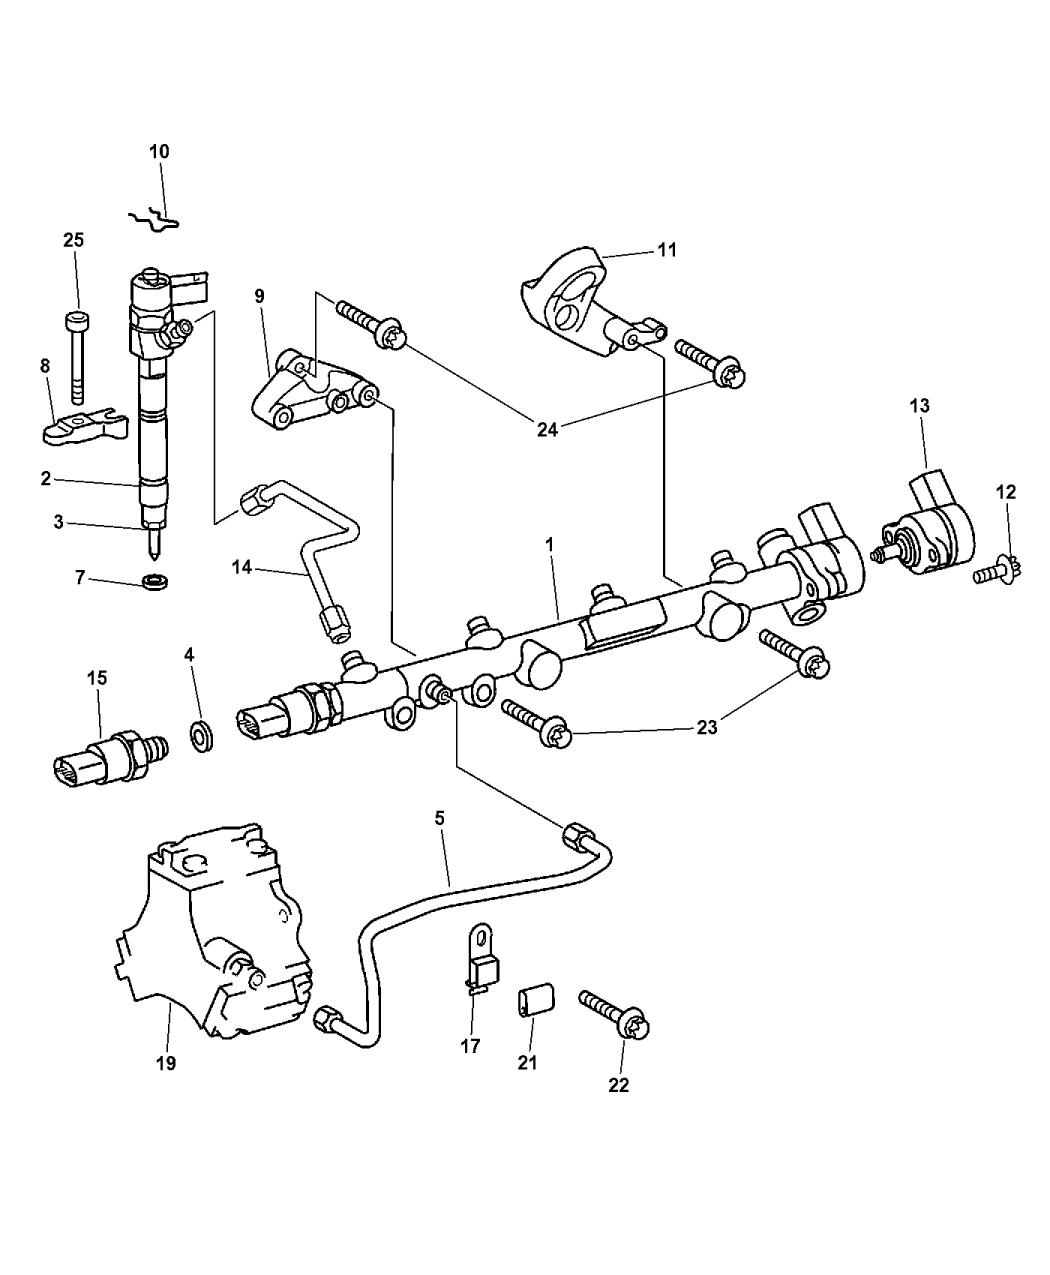 2008 chrysler pt cruiser fuel rail injectors rh moparpartsgiant com 3 8 L Engine Chrysler 2002 Town Country Chrysler 2.5 V6 Engine Diagram